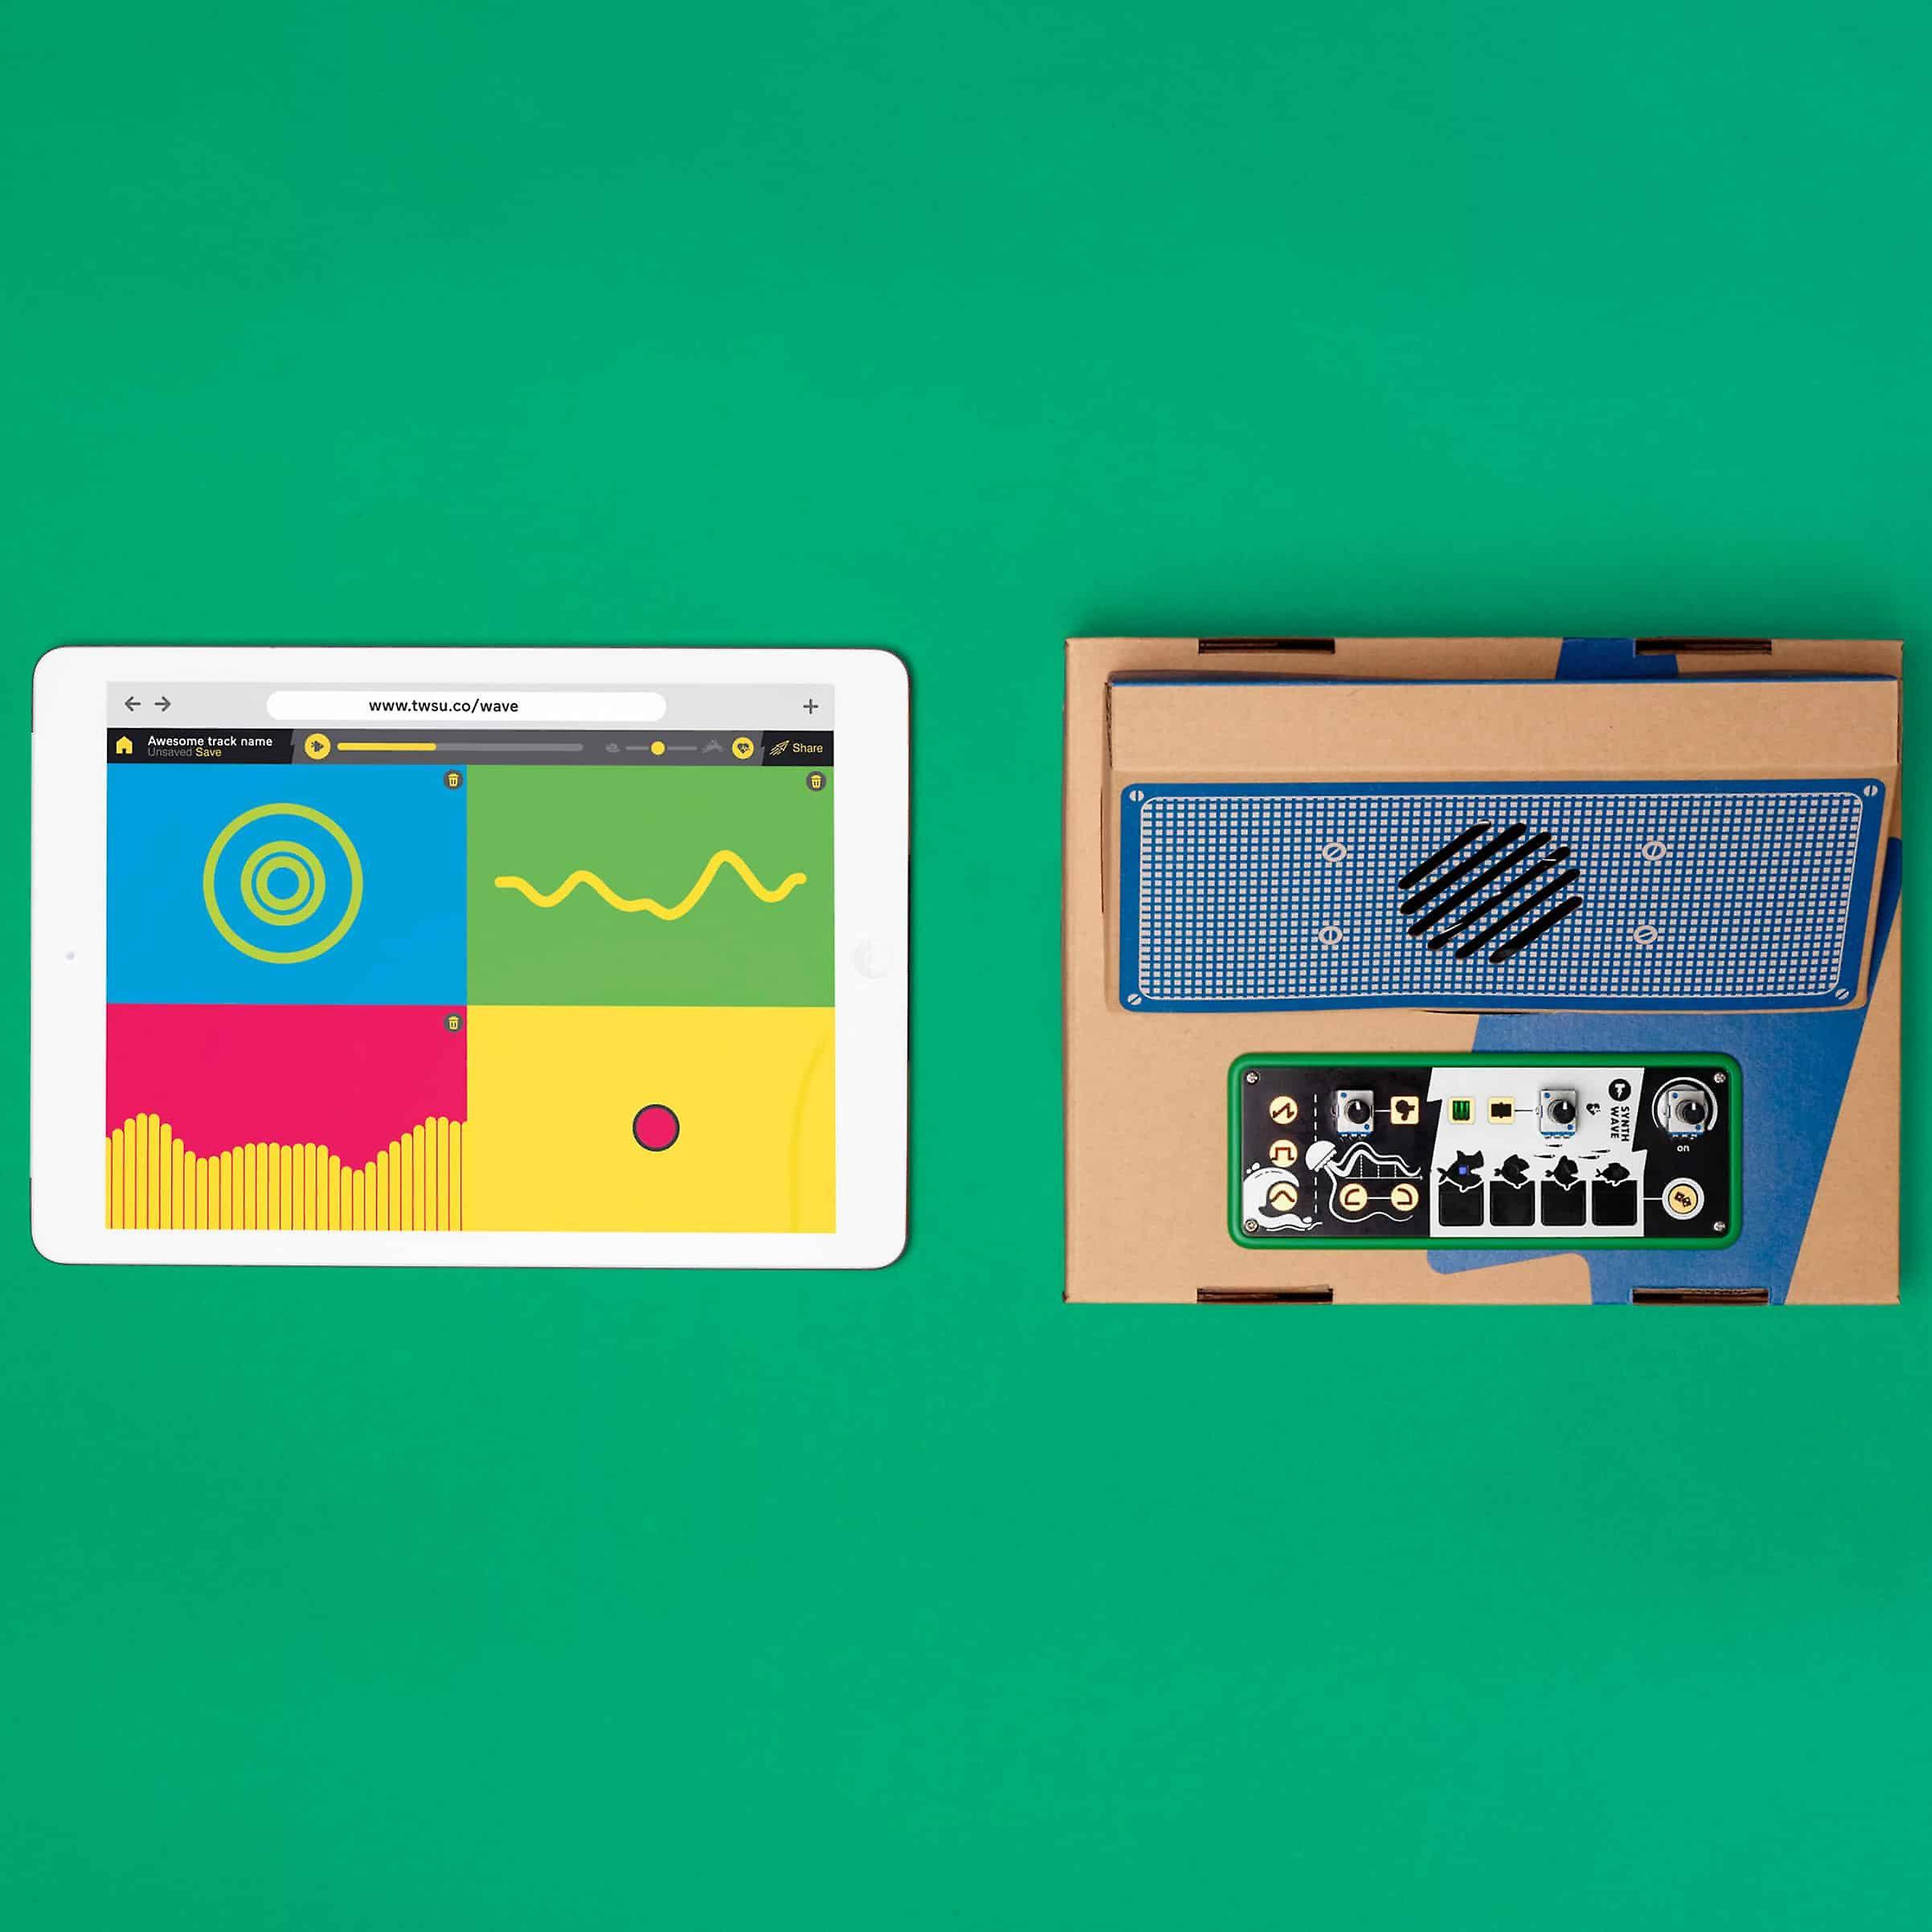 Tech zal ons te redden synth Wave Kit | Educatief muziek speeltje, vanaf 8 jaar